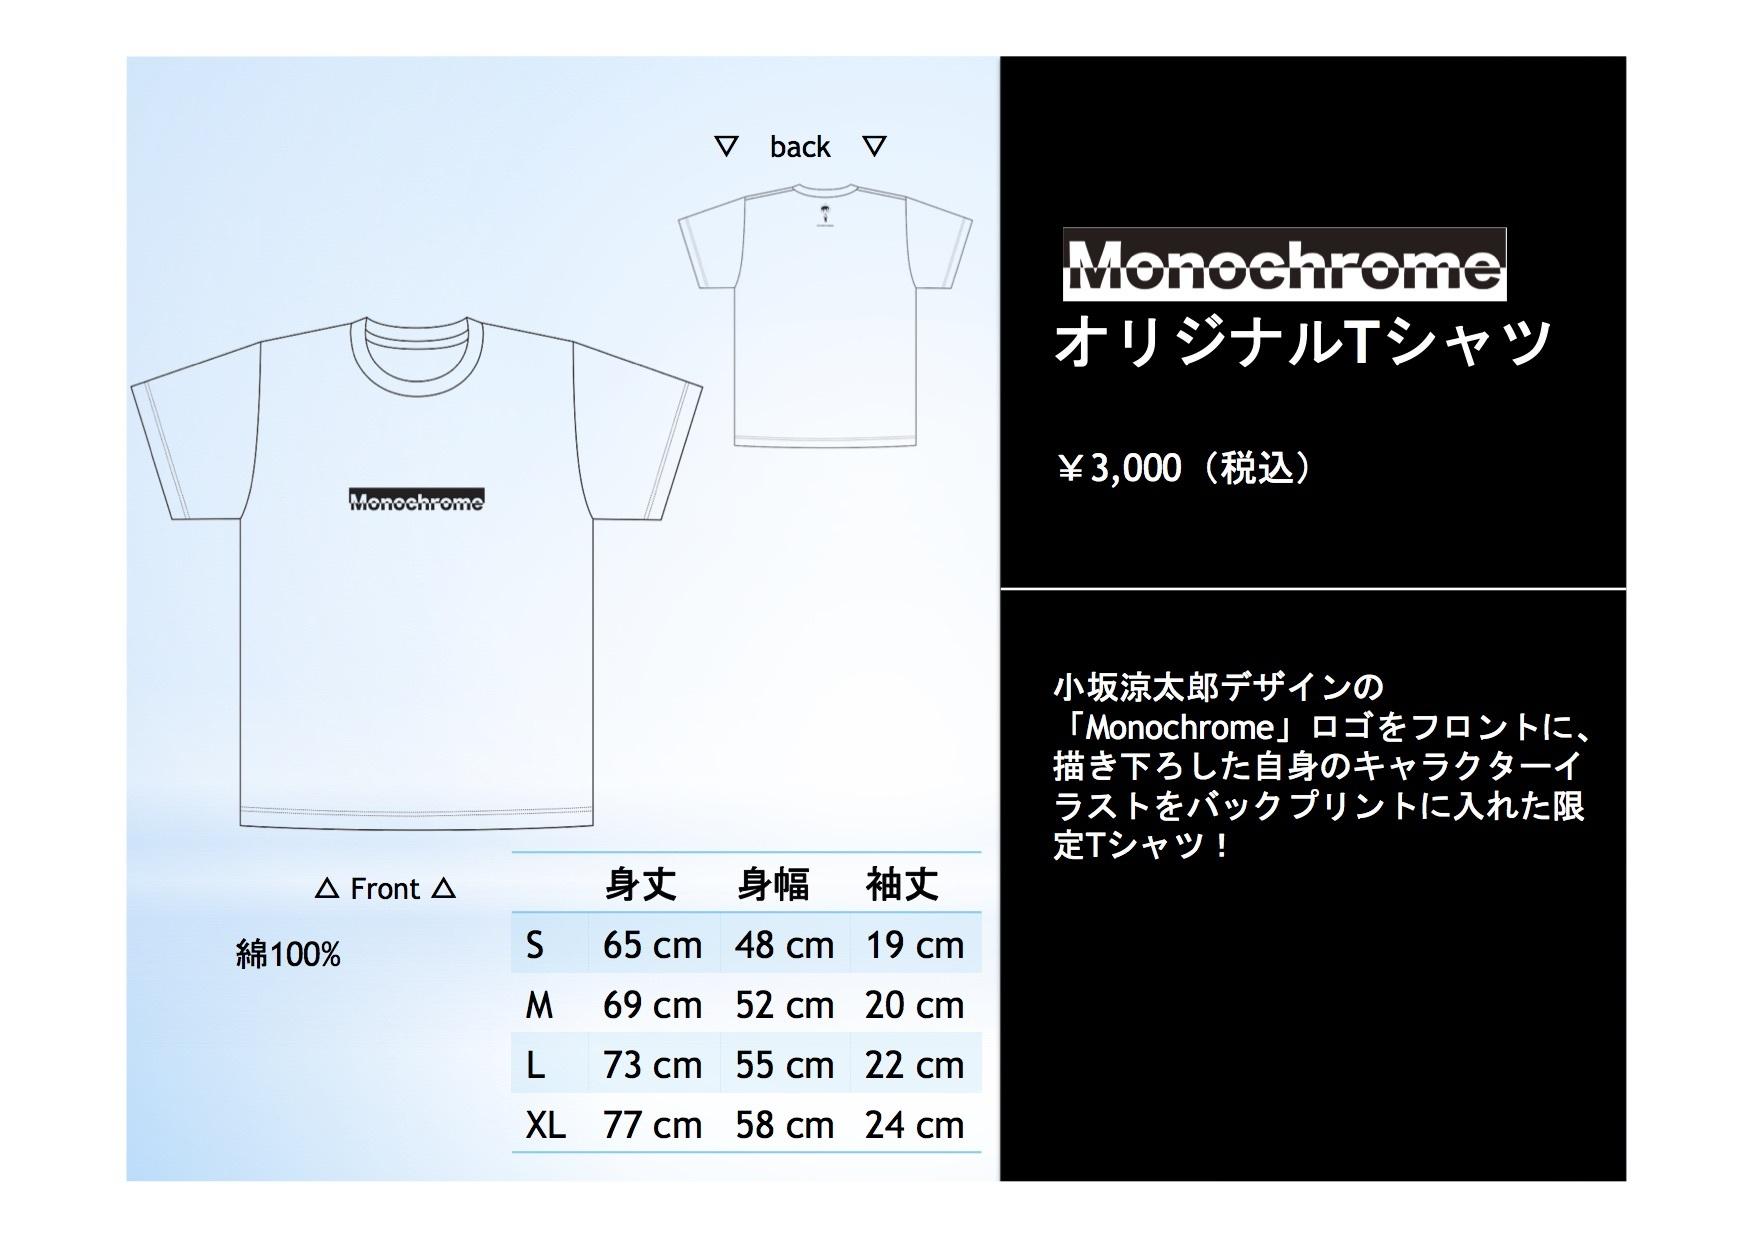 MonochromeオリジナルTシャツ(ホワイト)